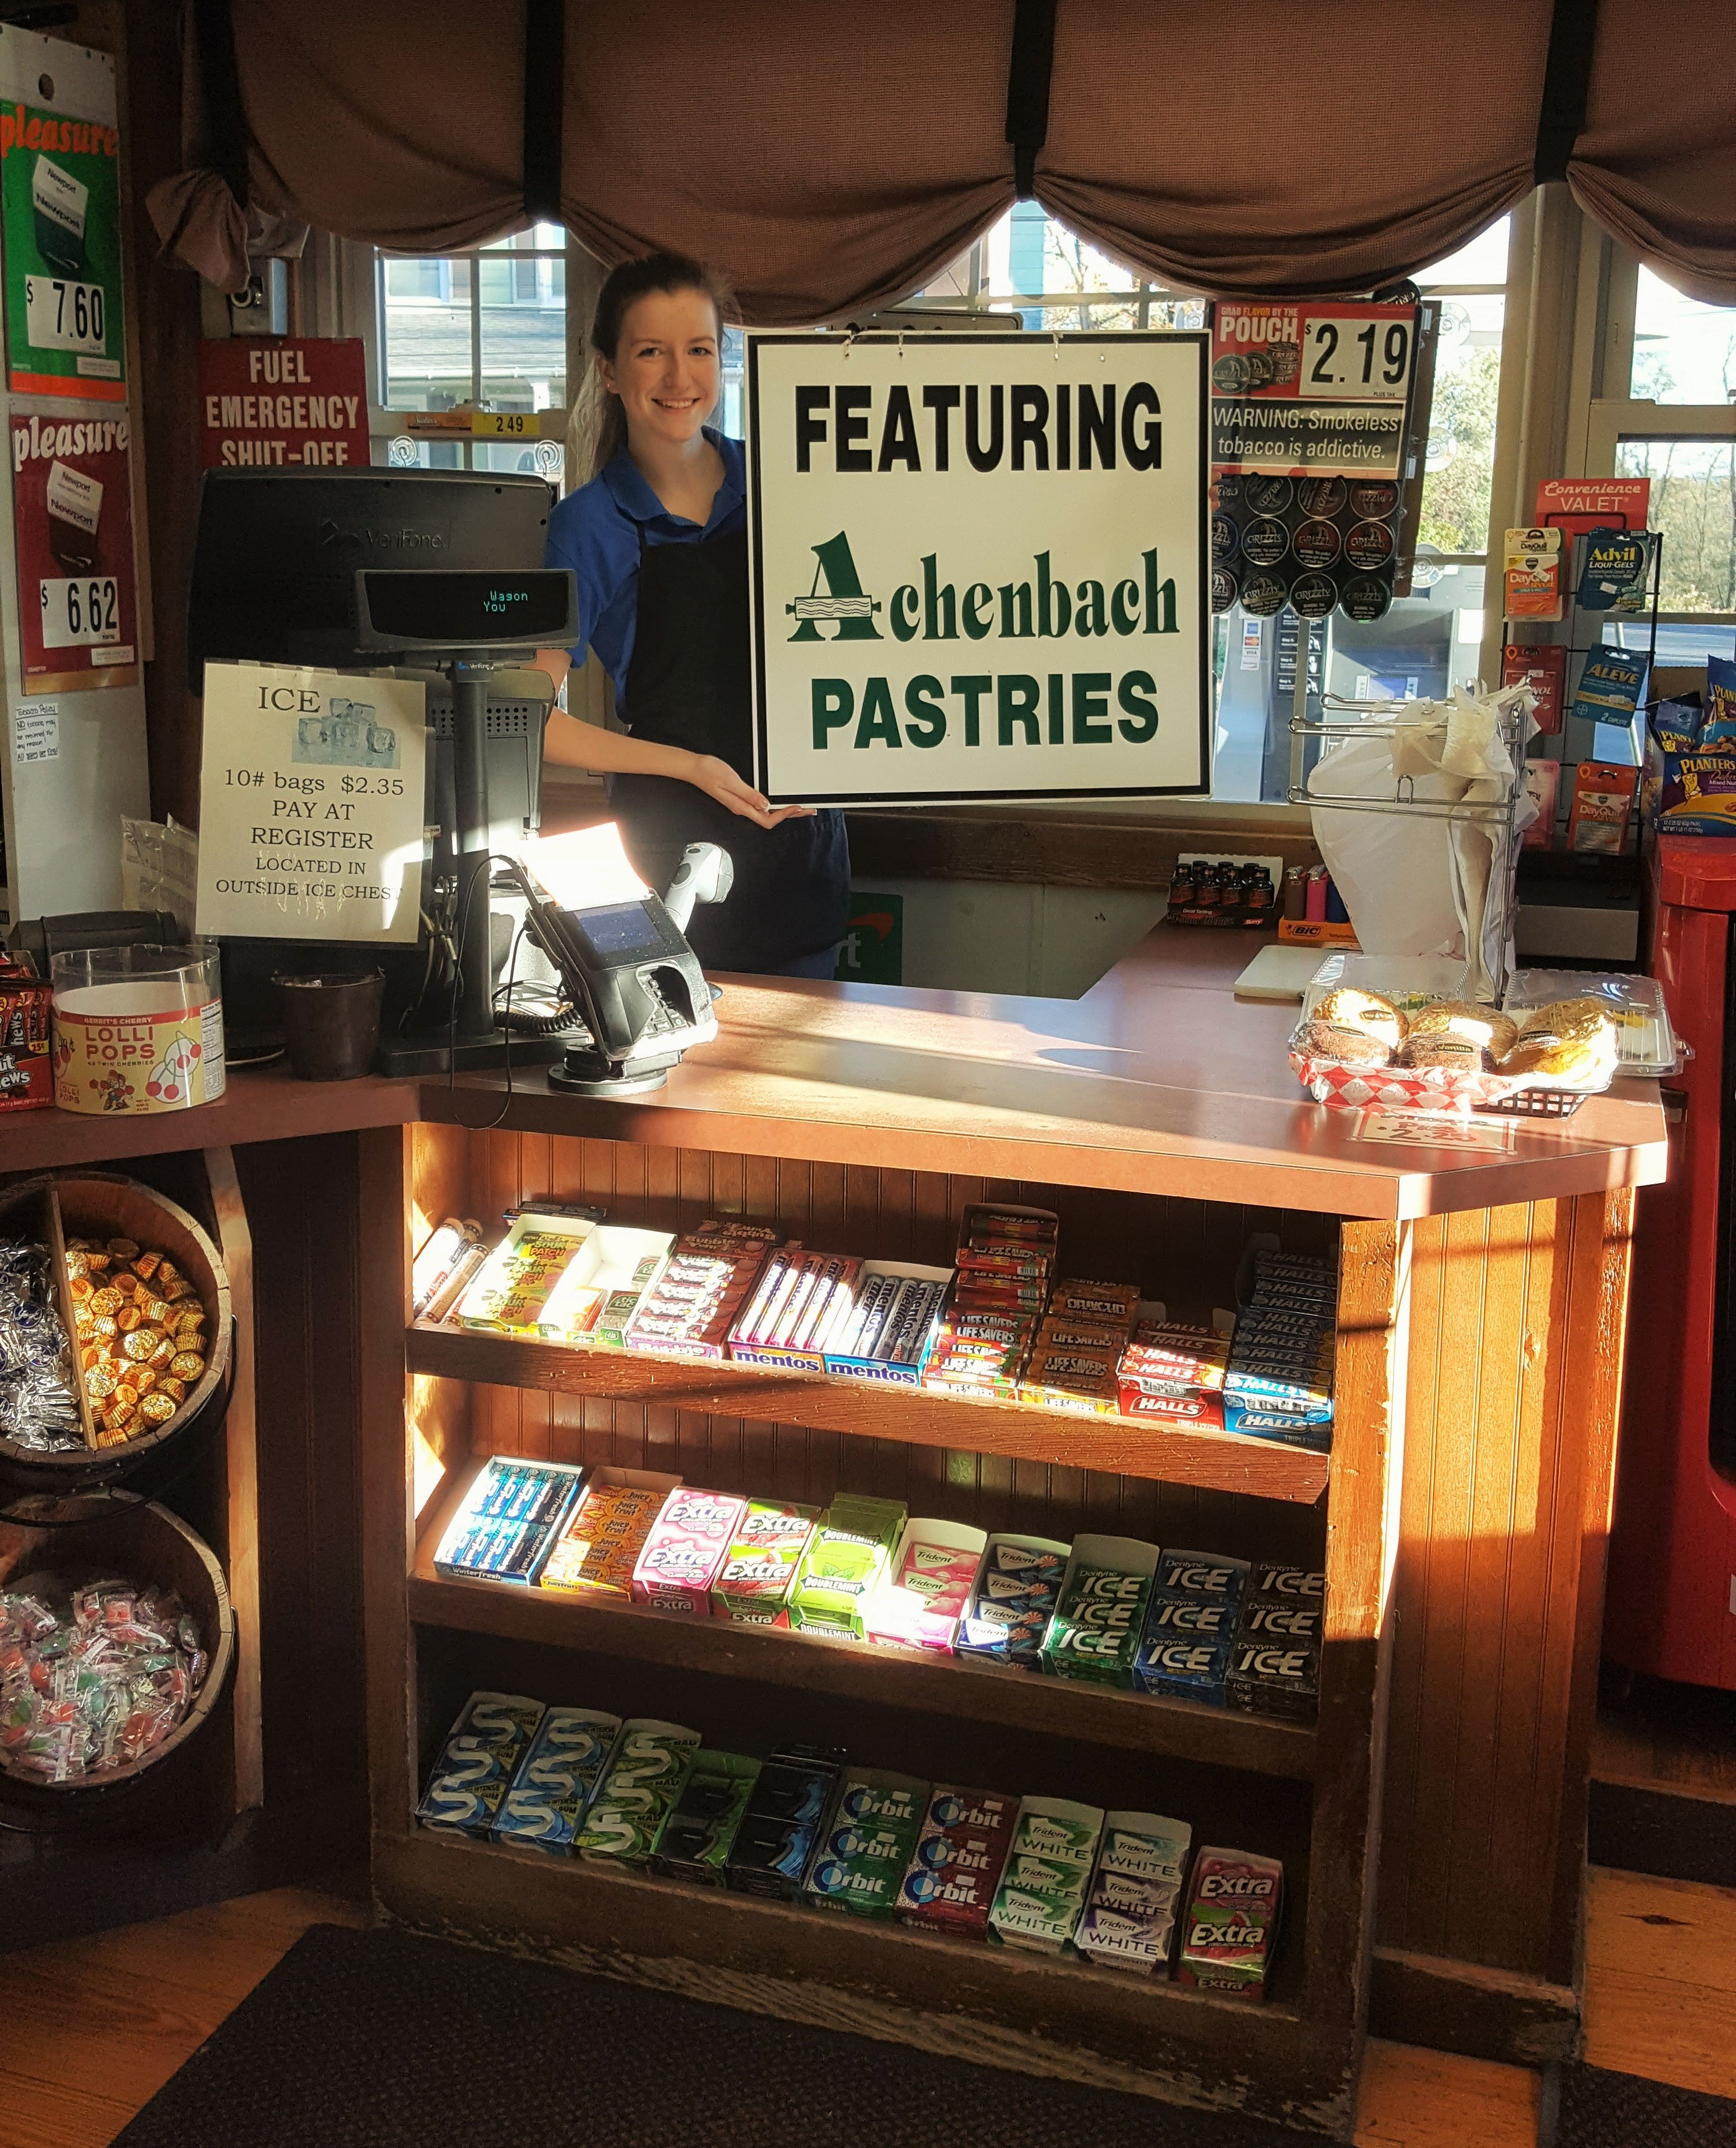 Achenbach's Pastries at the Conestoga Wagon in Lancaster, PA.